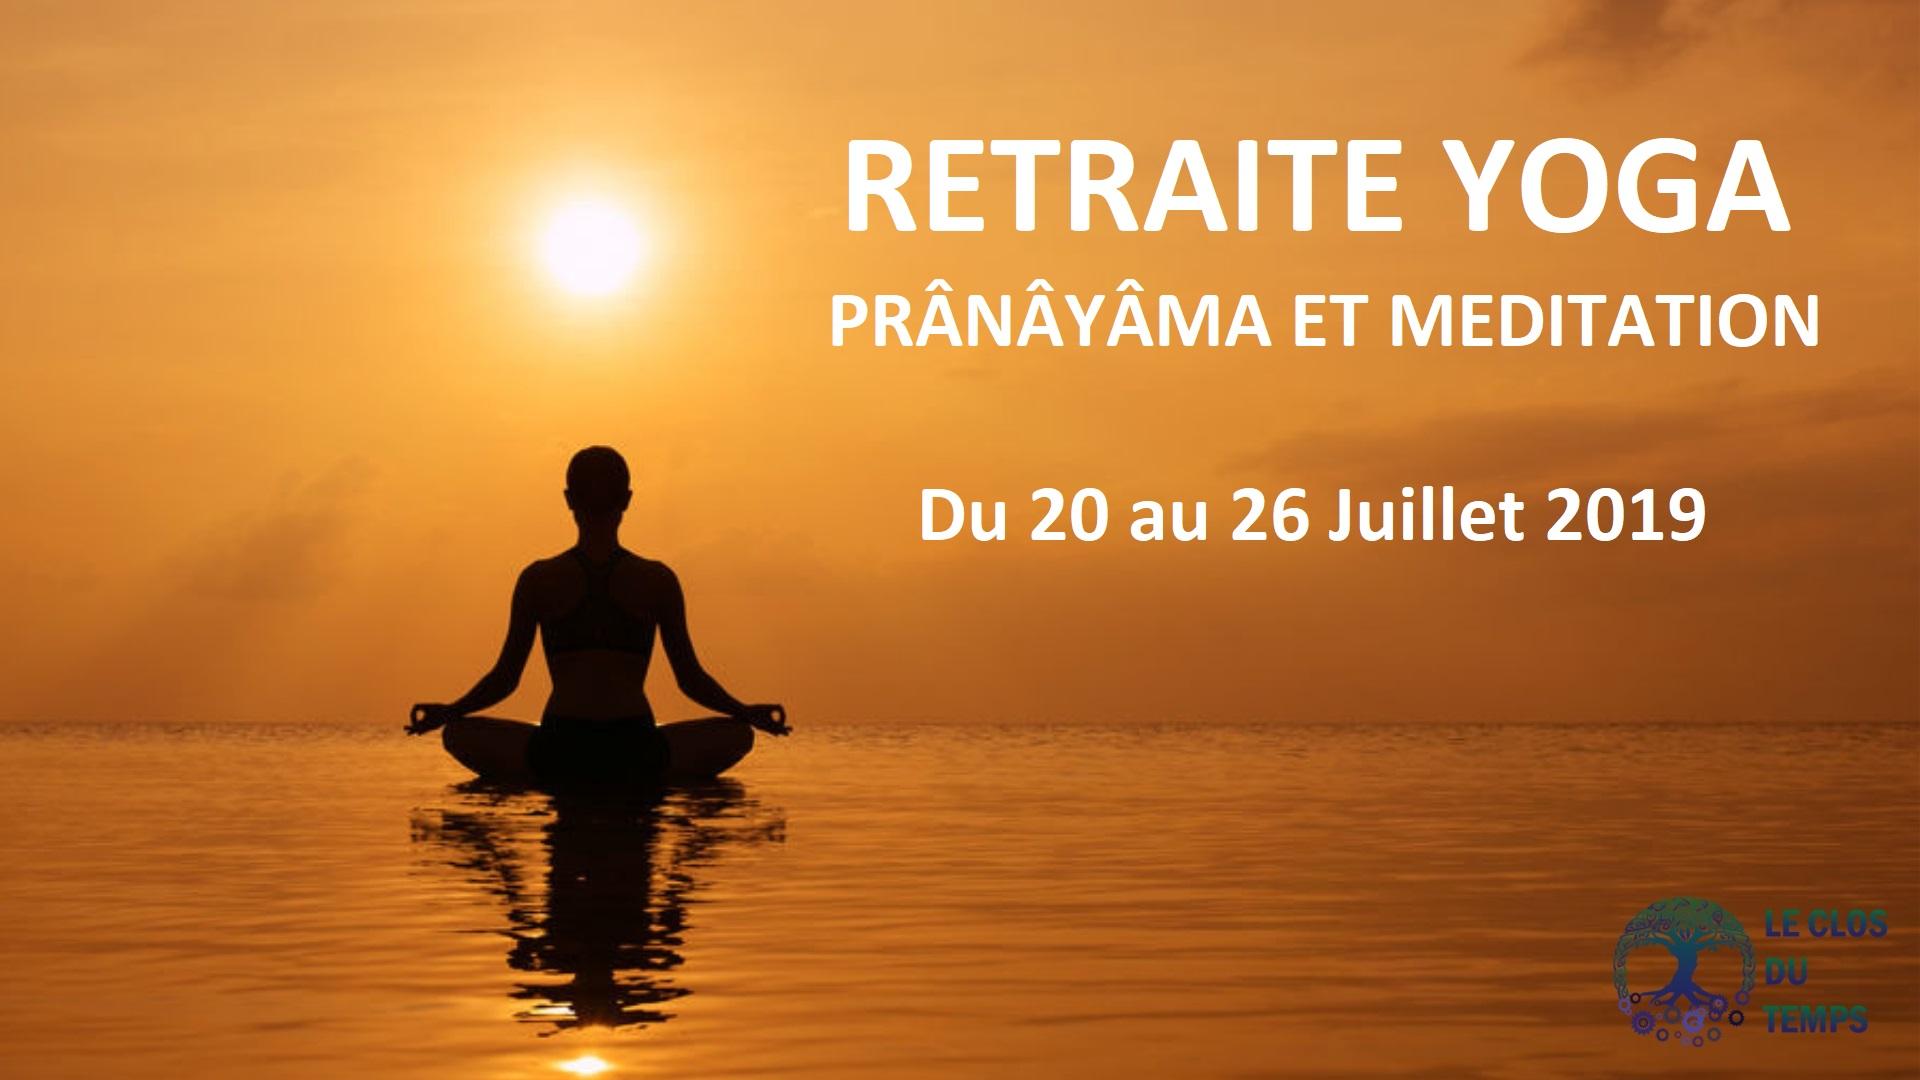 Retraite MÈditation et Yoga Pranayama